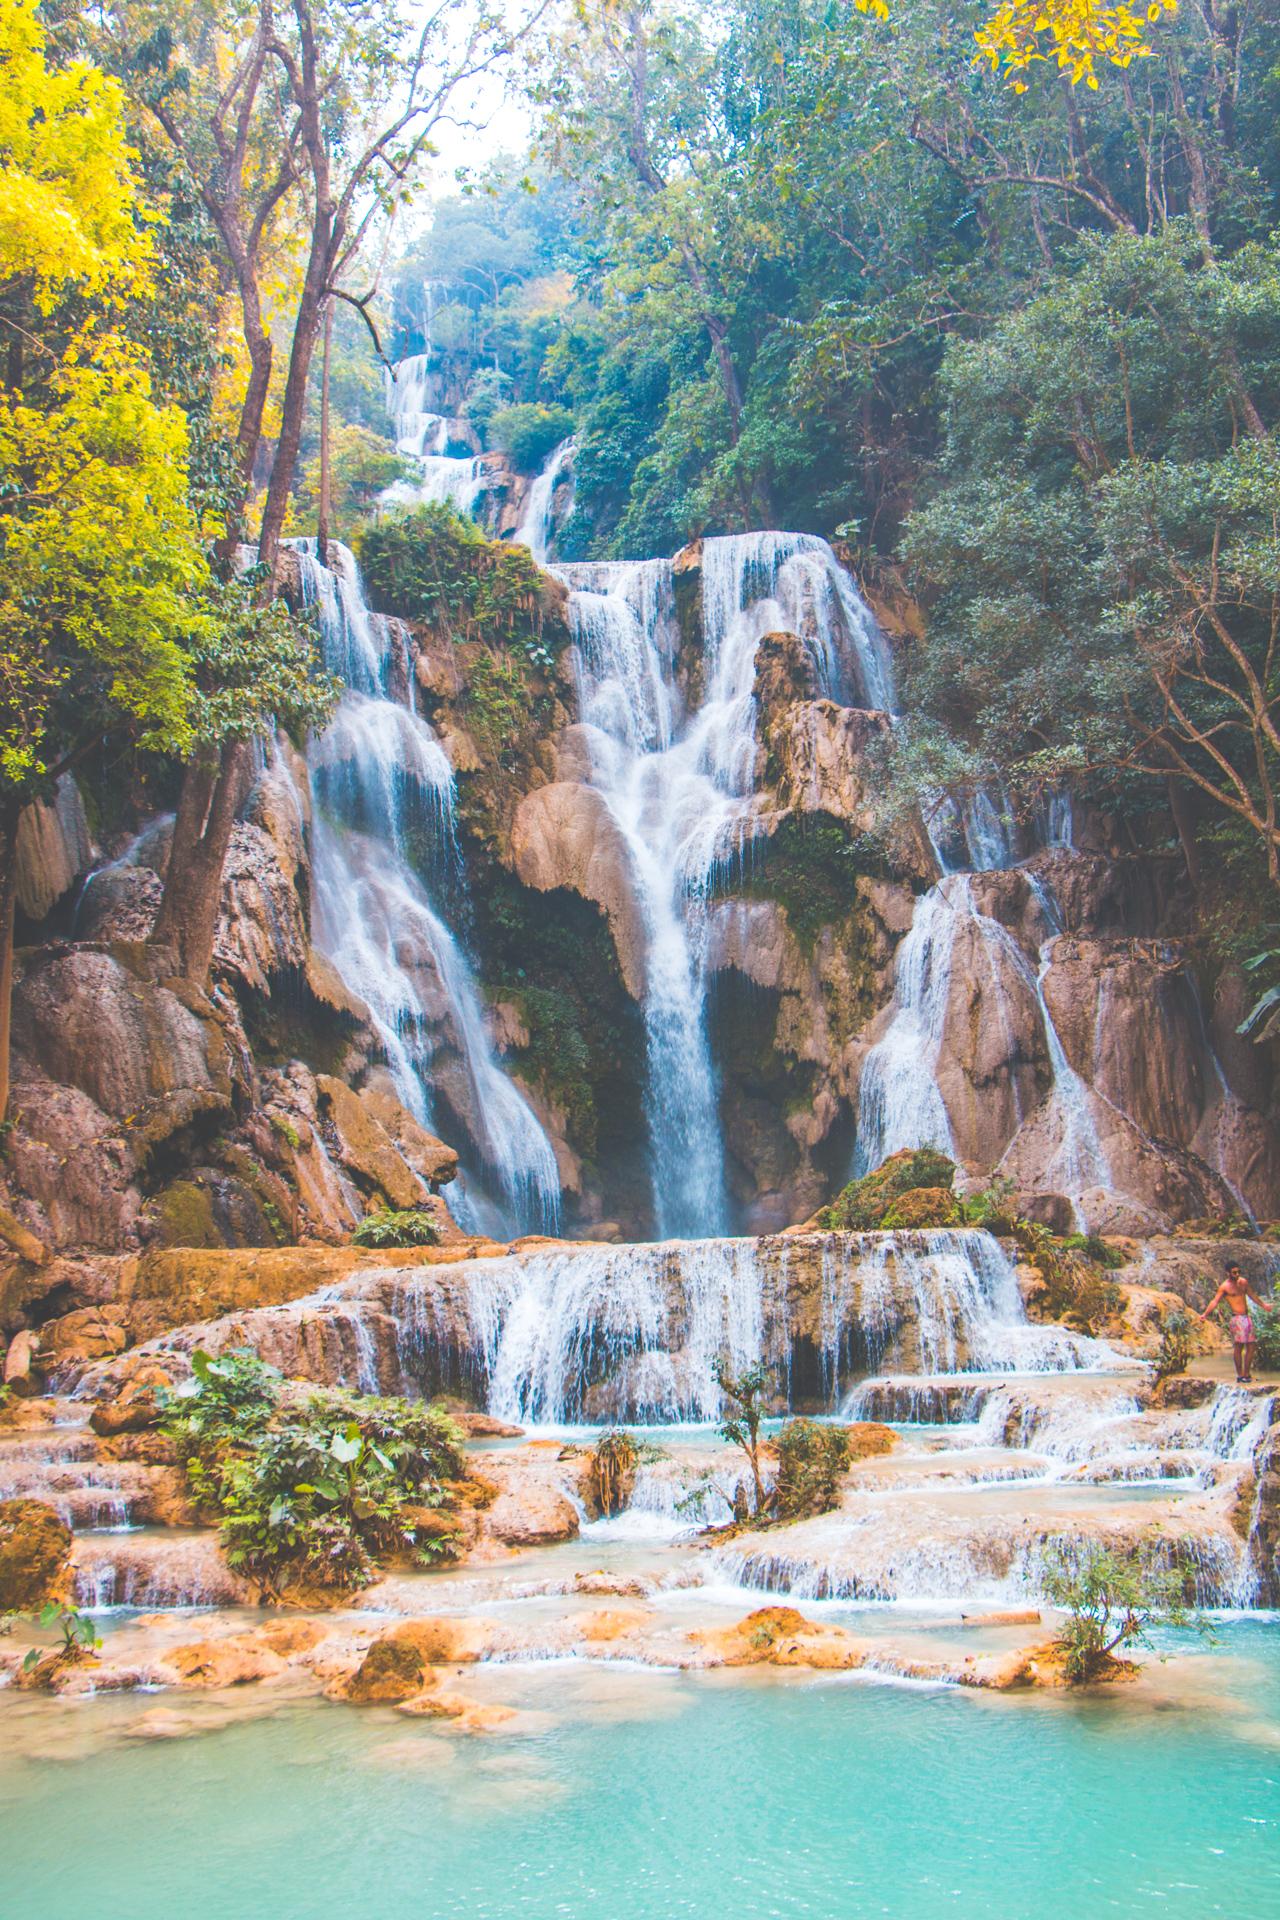 Kuang Si Falls cascading near Luang Prabang